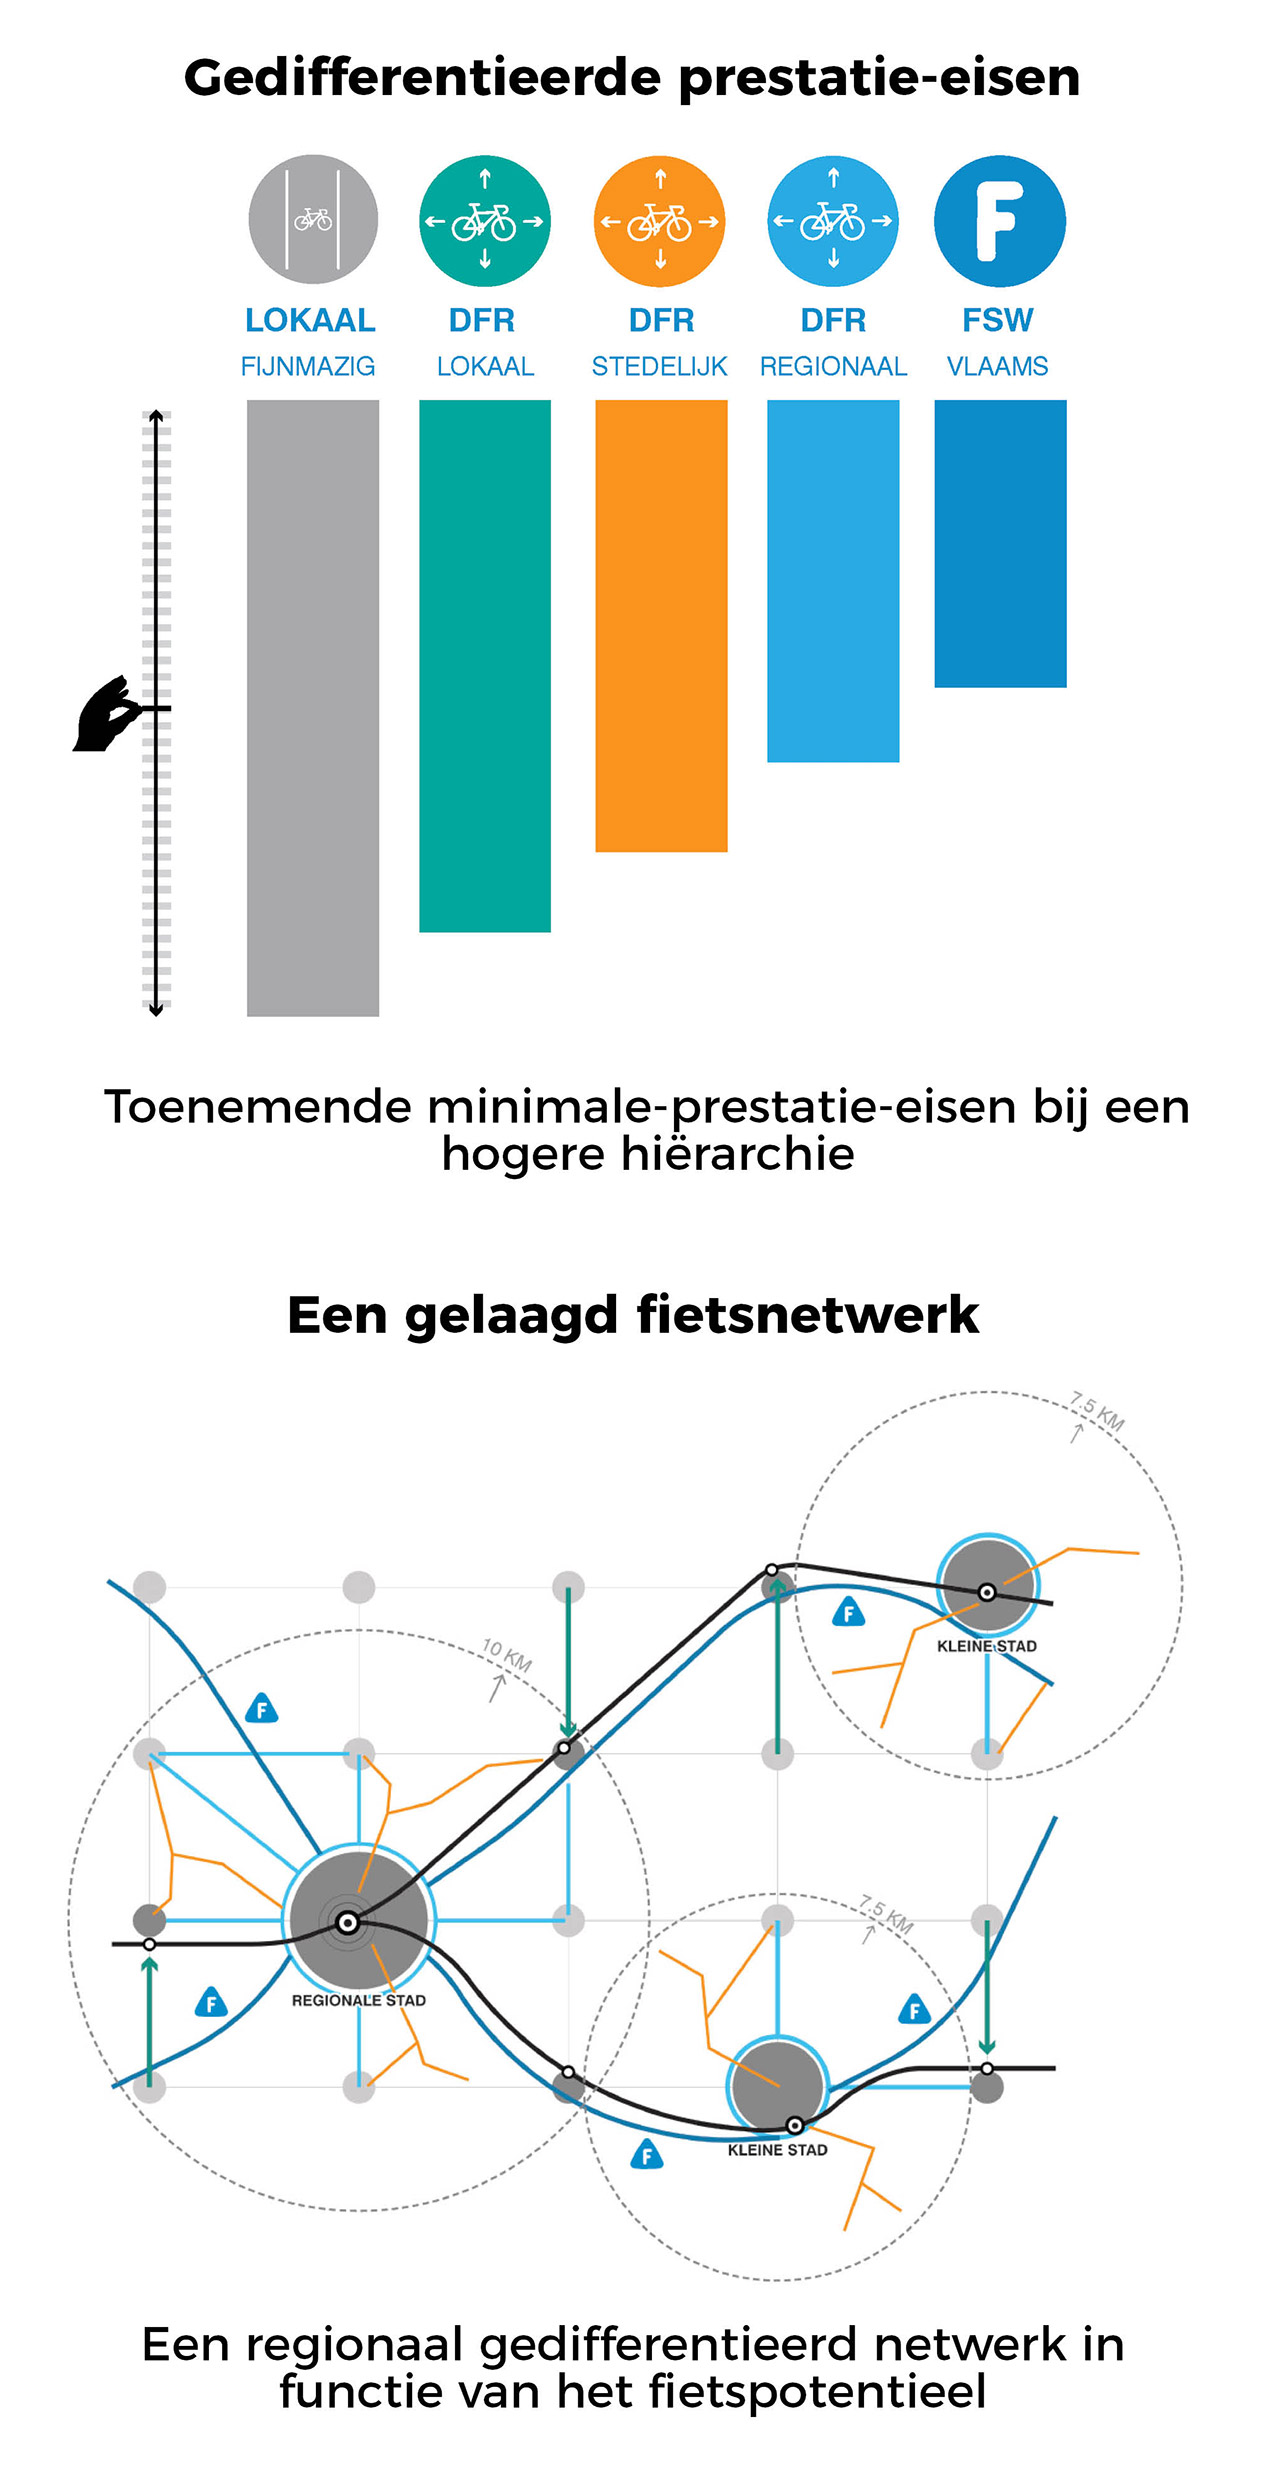 Mobiliteitsnetwerk03_02